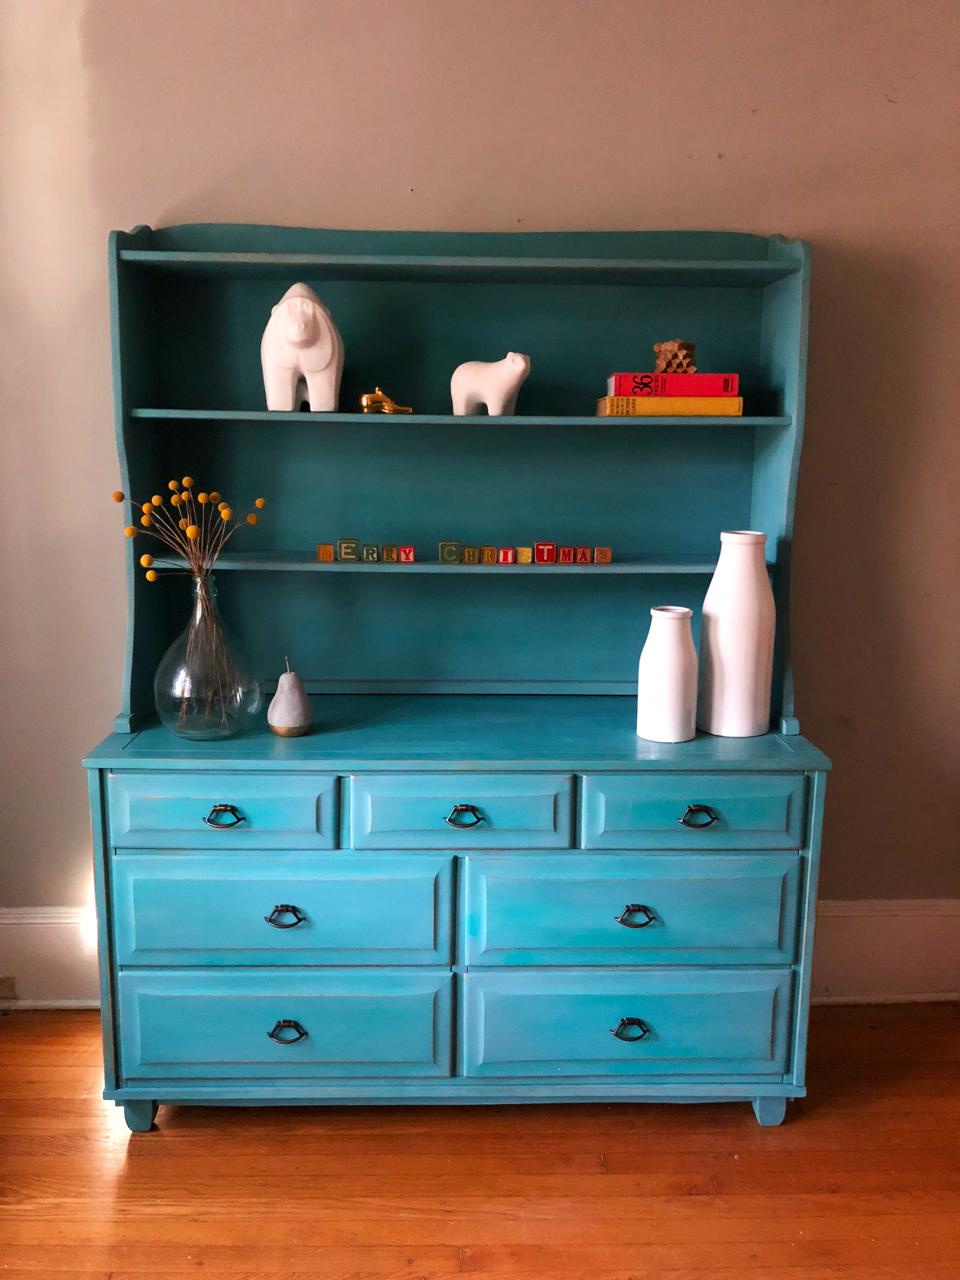 jo-torrijos-a-simpler-design-atlanta-painted-furniture-turquoise-buffet-hutch-2.jpg